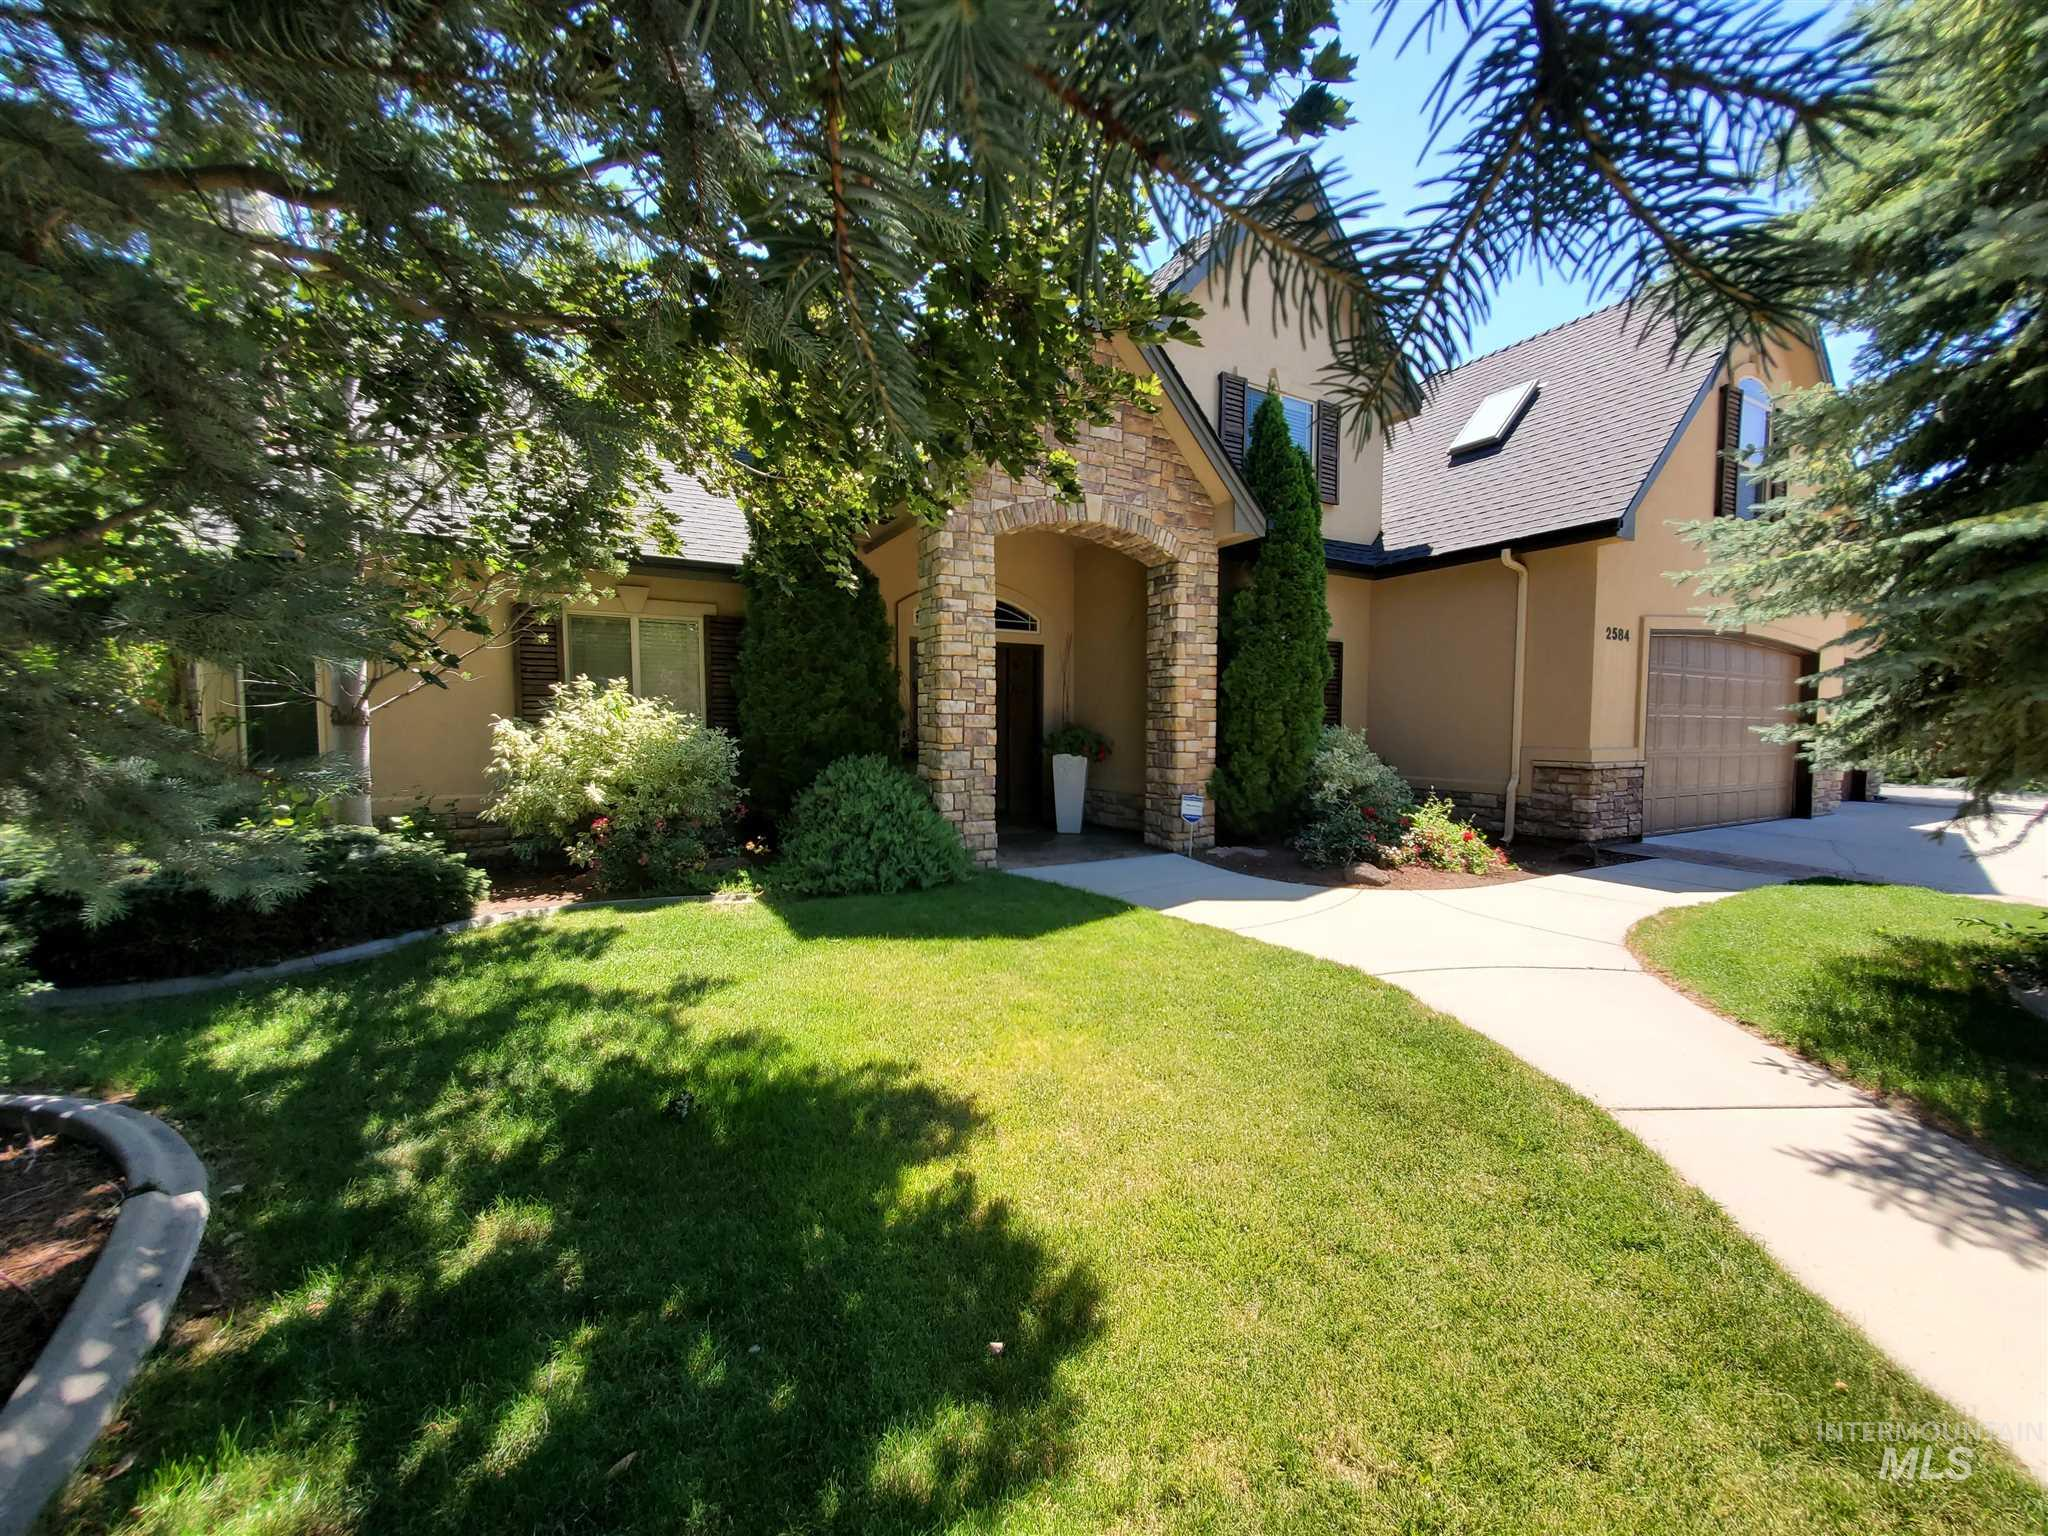 2584 N Bullock Ave Property Photo